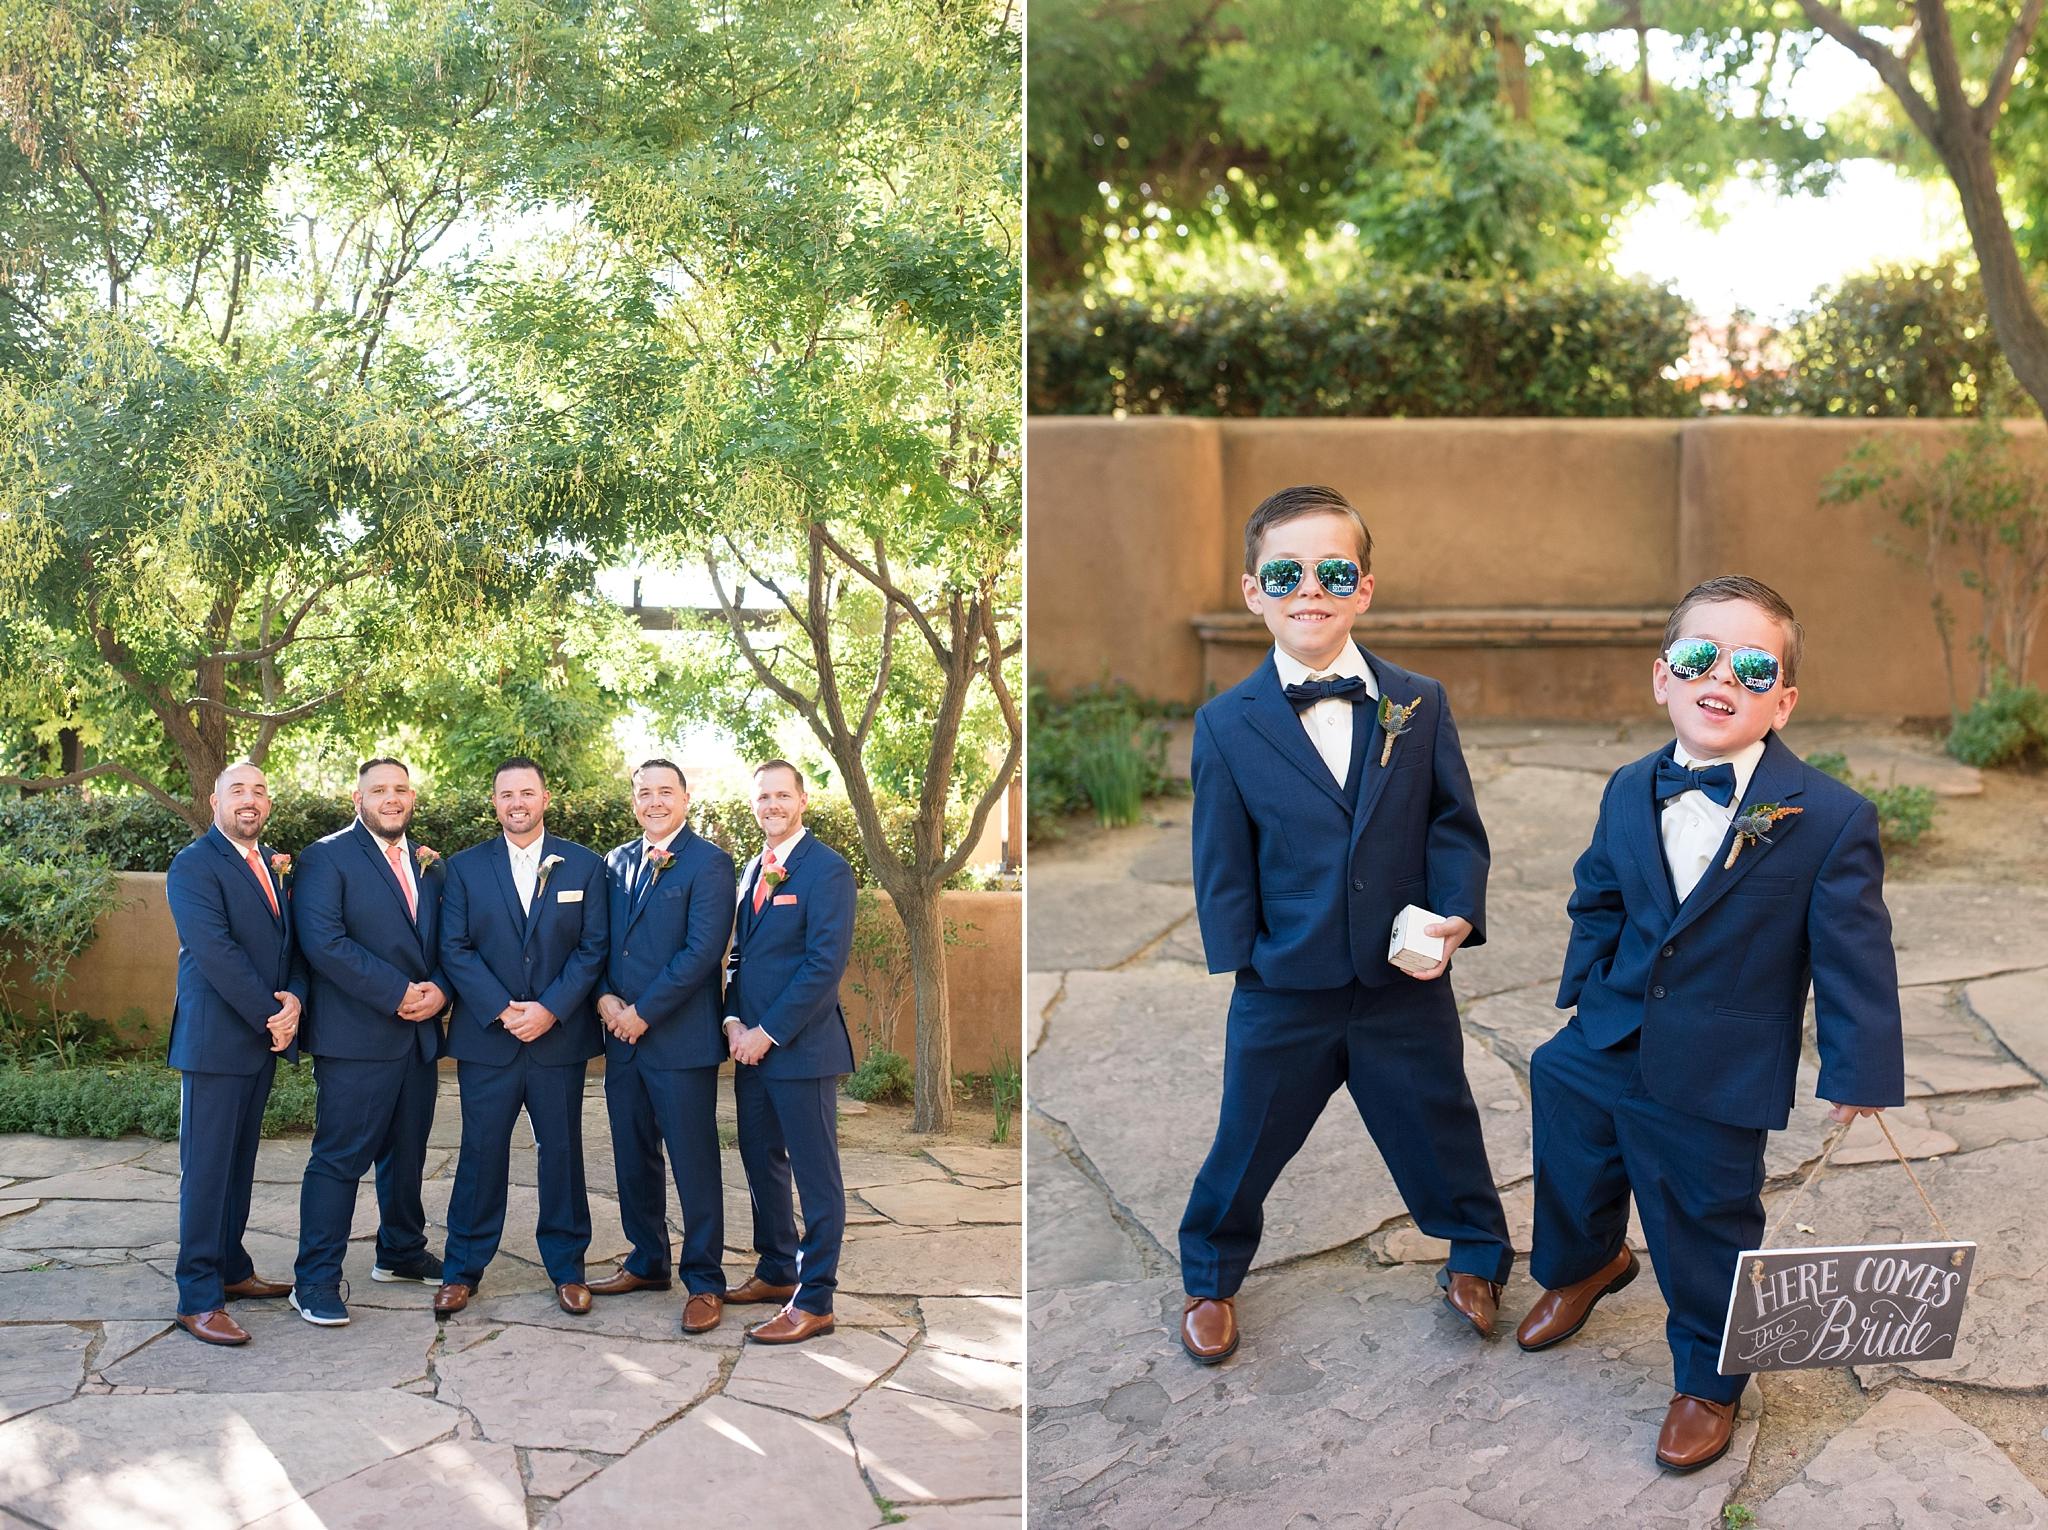 hotel albuquerque wedding photographer new mexico ann matthews bridal dress mens wearhouse cutmaster music dj courtyard coral navy blue